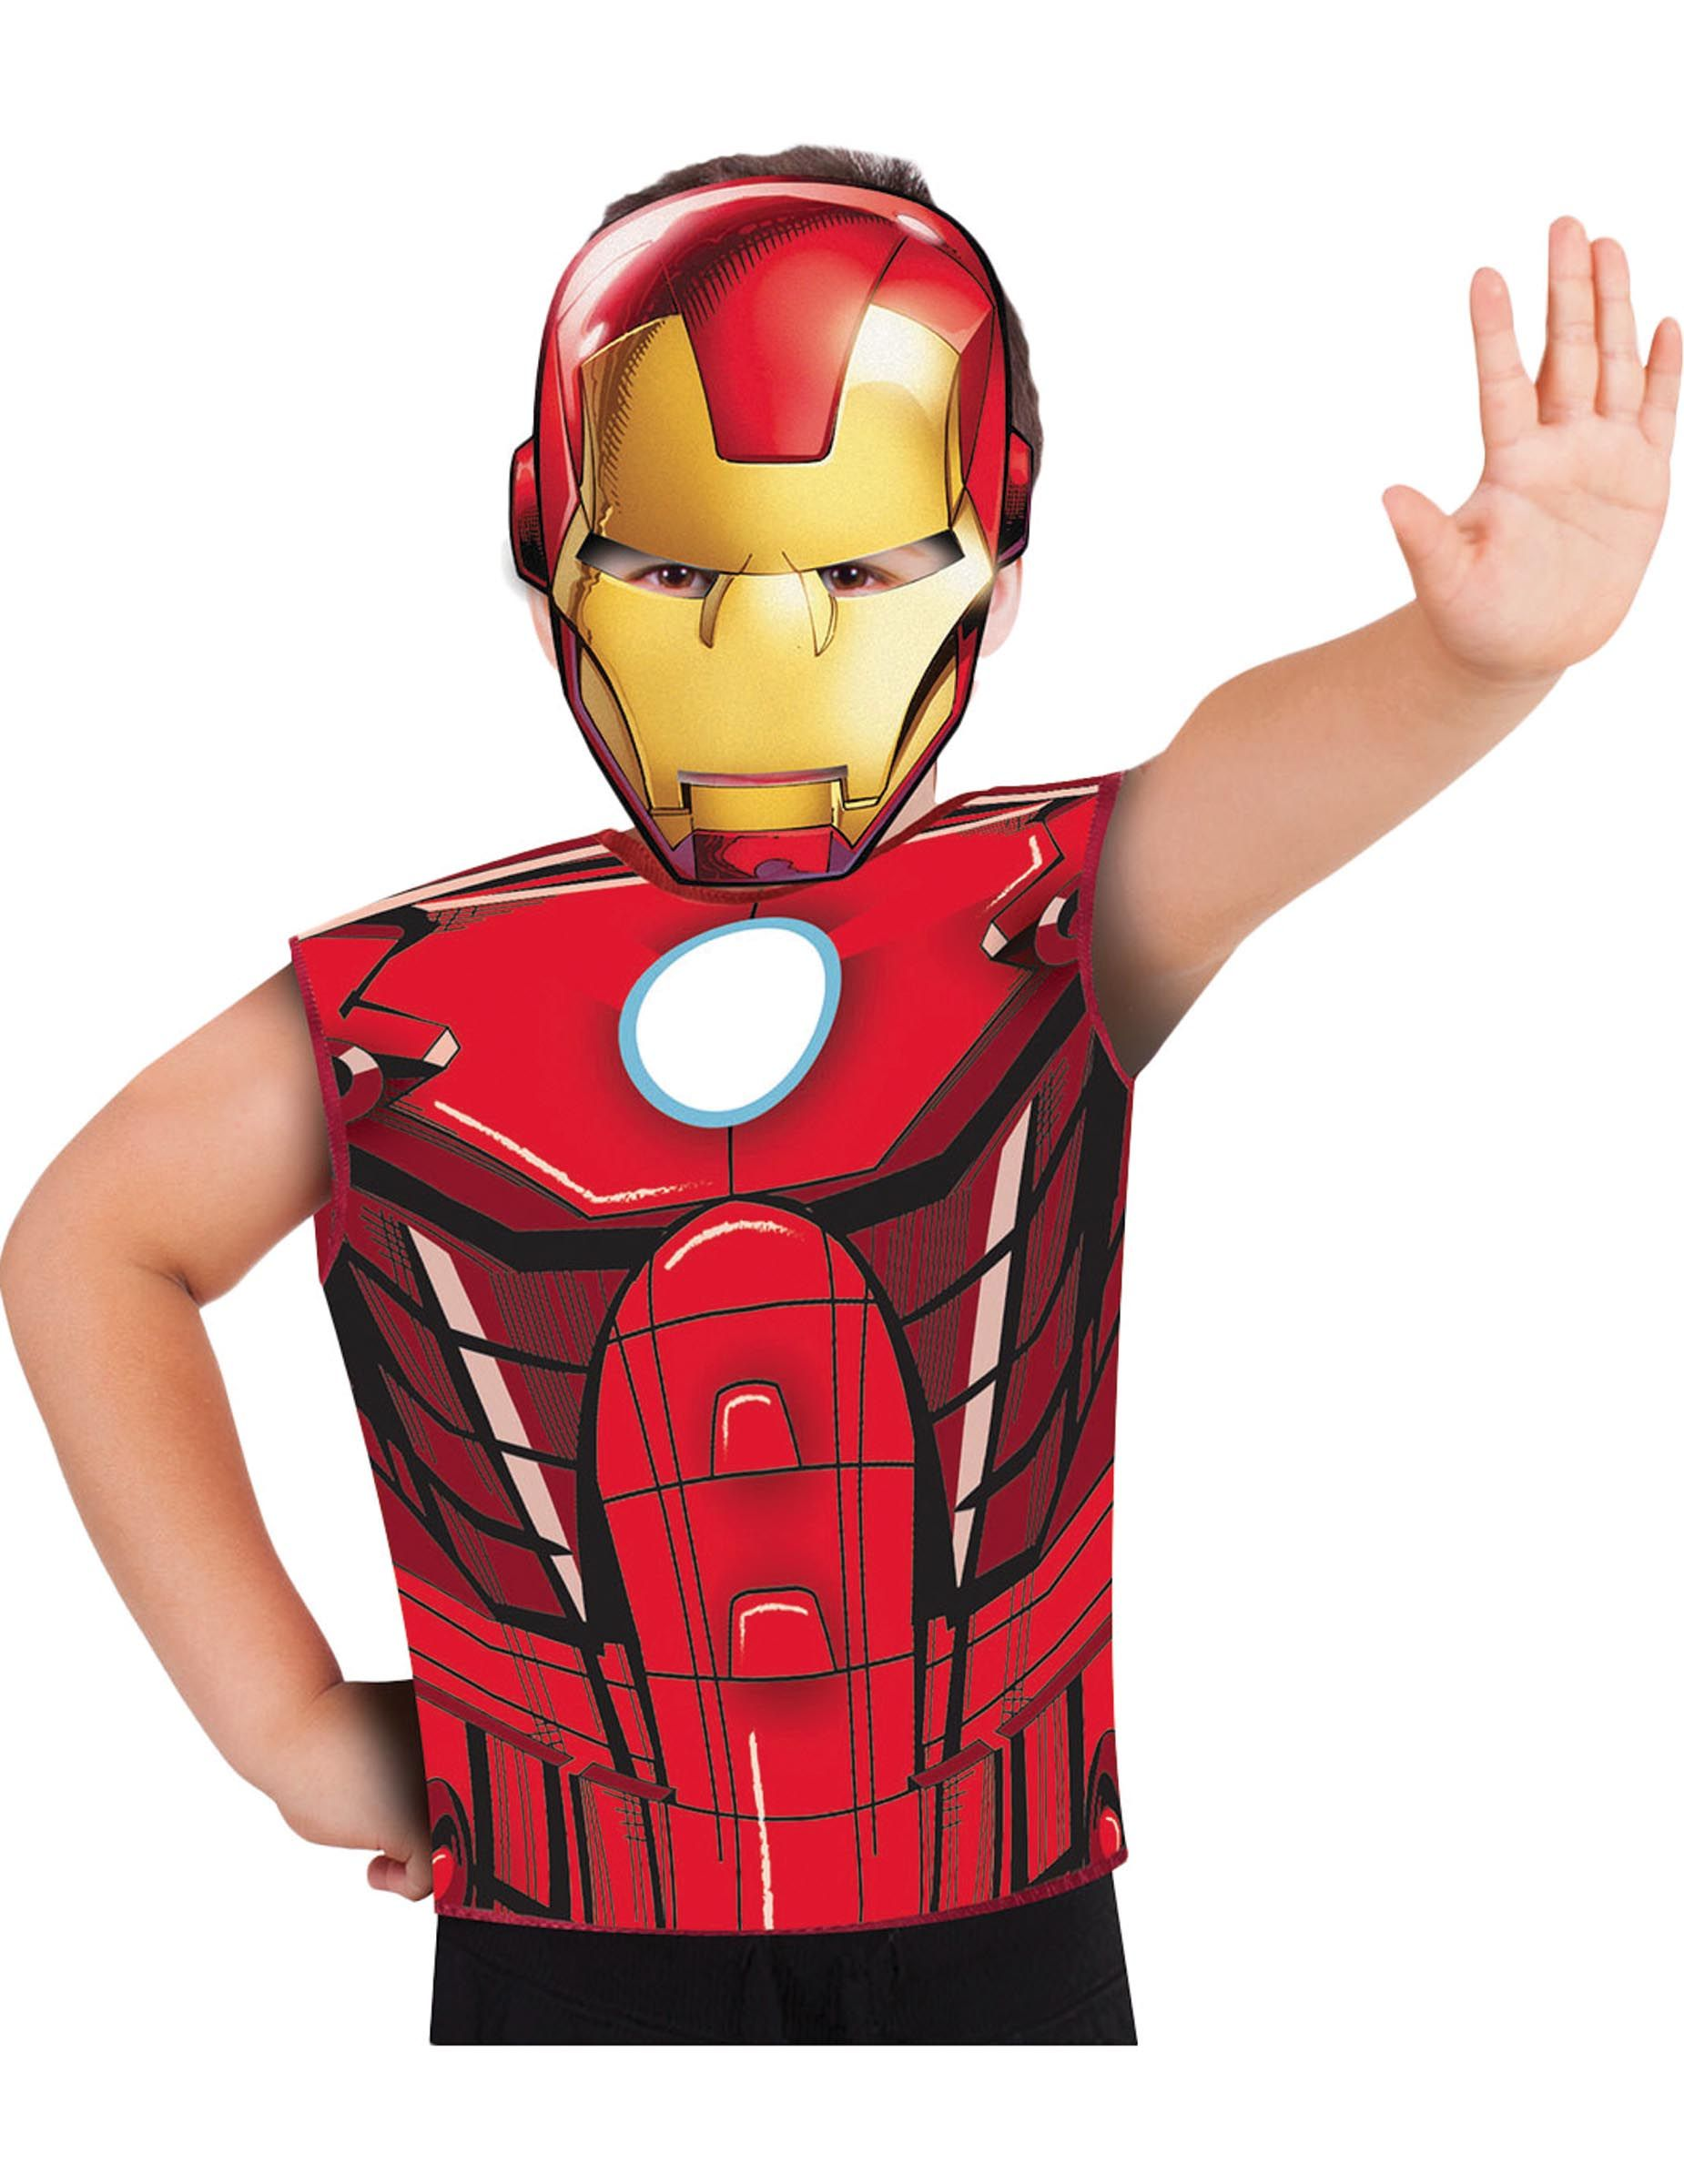 Iron Man Toddler Kids Marvel Iron Man Muscle Halloween Costume 3t 4t 3t Halloween Costumes Ironman Costume Iron Man Birthday